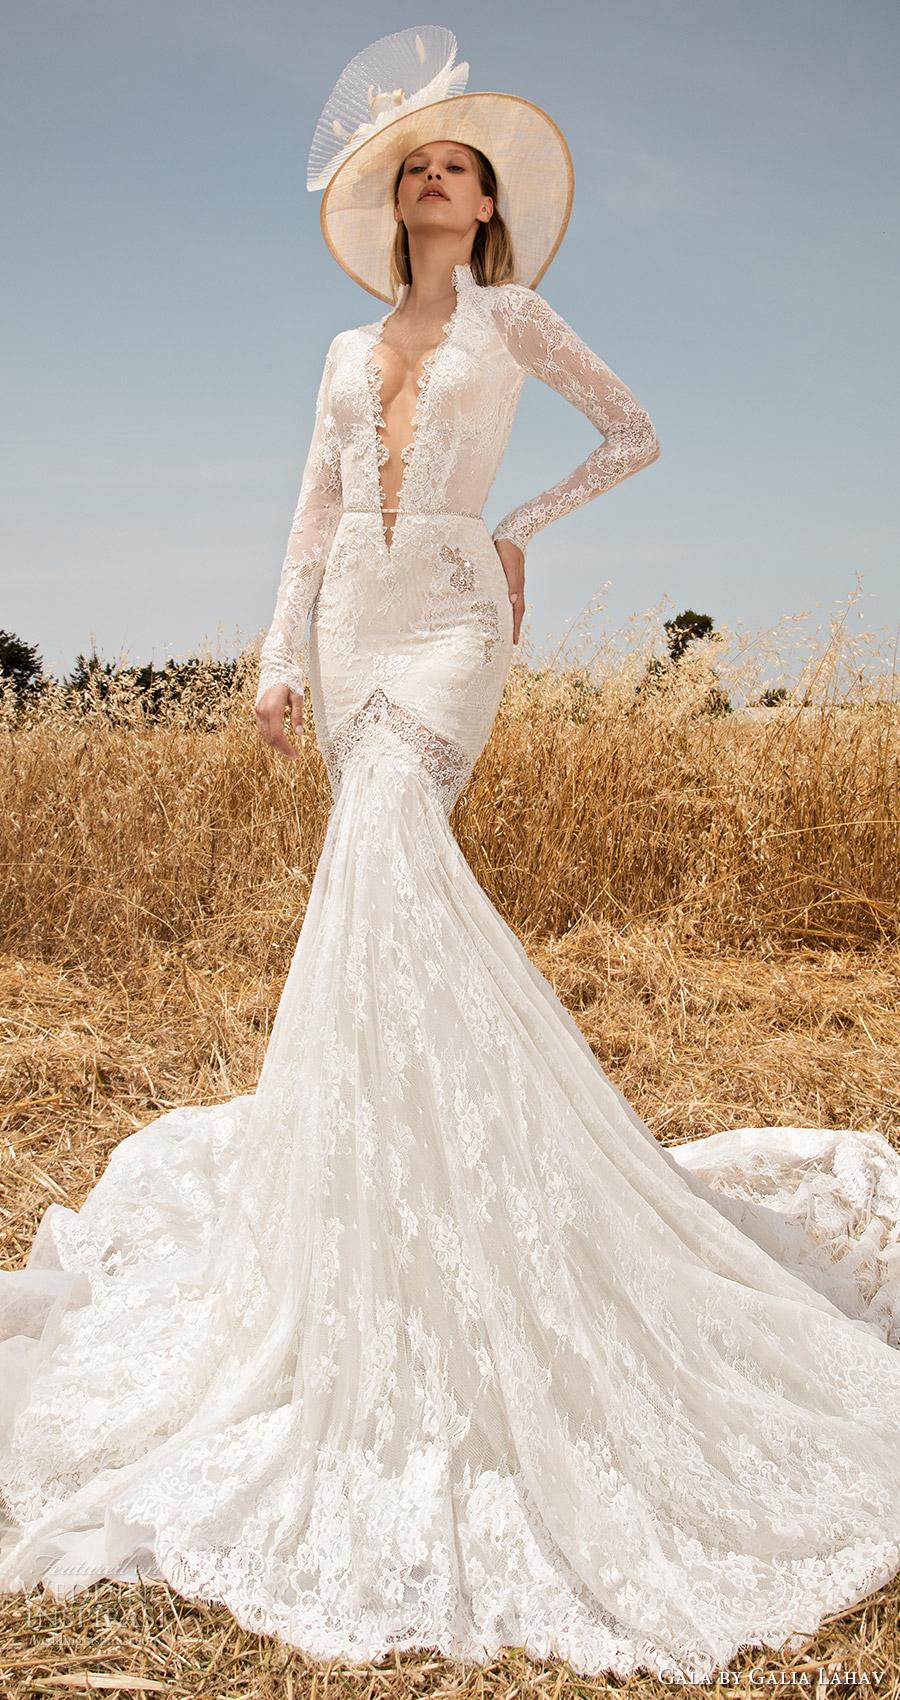 traje de gala galia Lahav primavera 2017 mangas largas ilusión de profundidad vneck boda de la sirena del cordón (701) mv